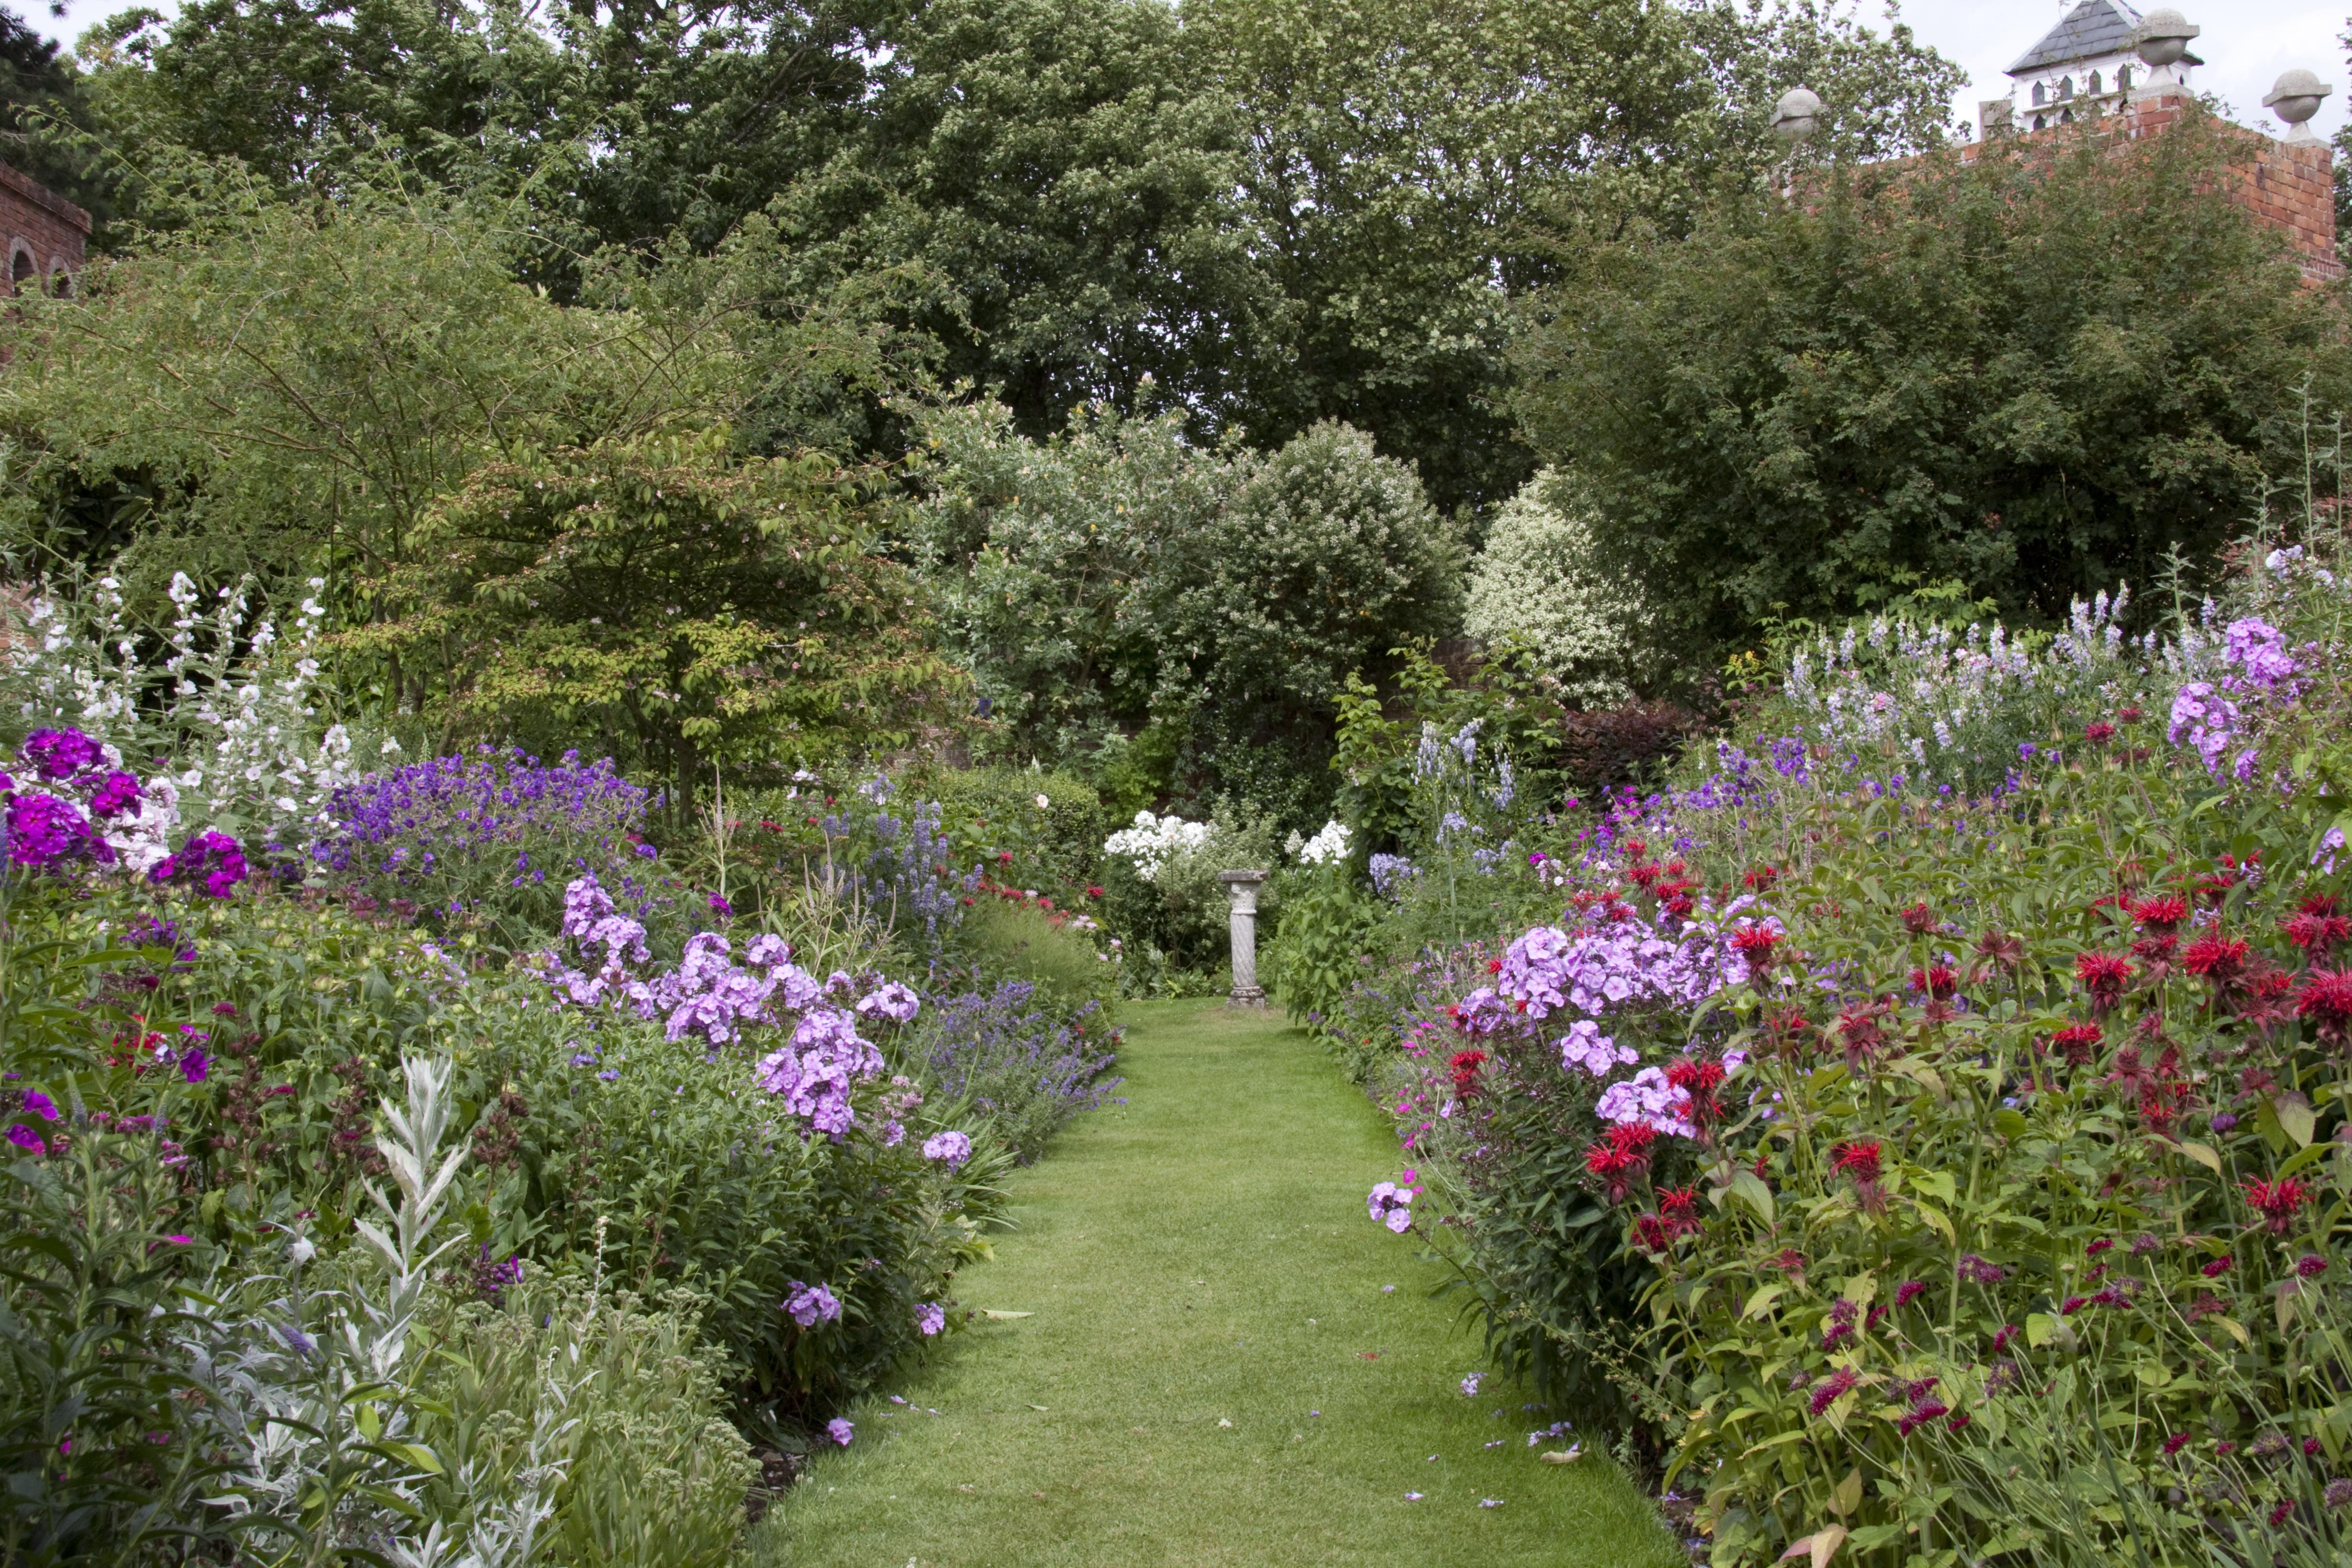 Filestone house cottage garden 8 4779901449g wikimedia commons filestone house cottage garden 8 4779901449g workwithnaturefo